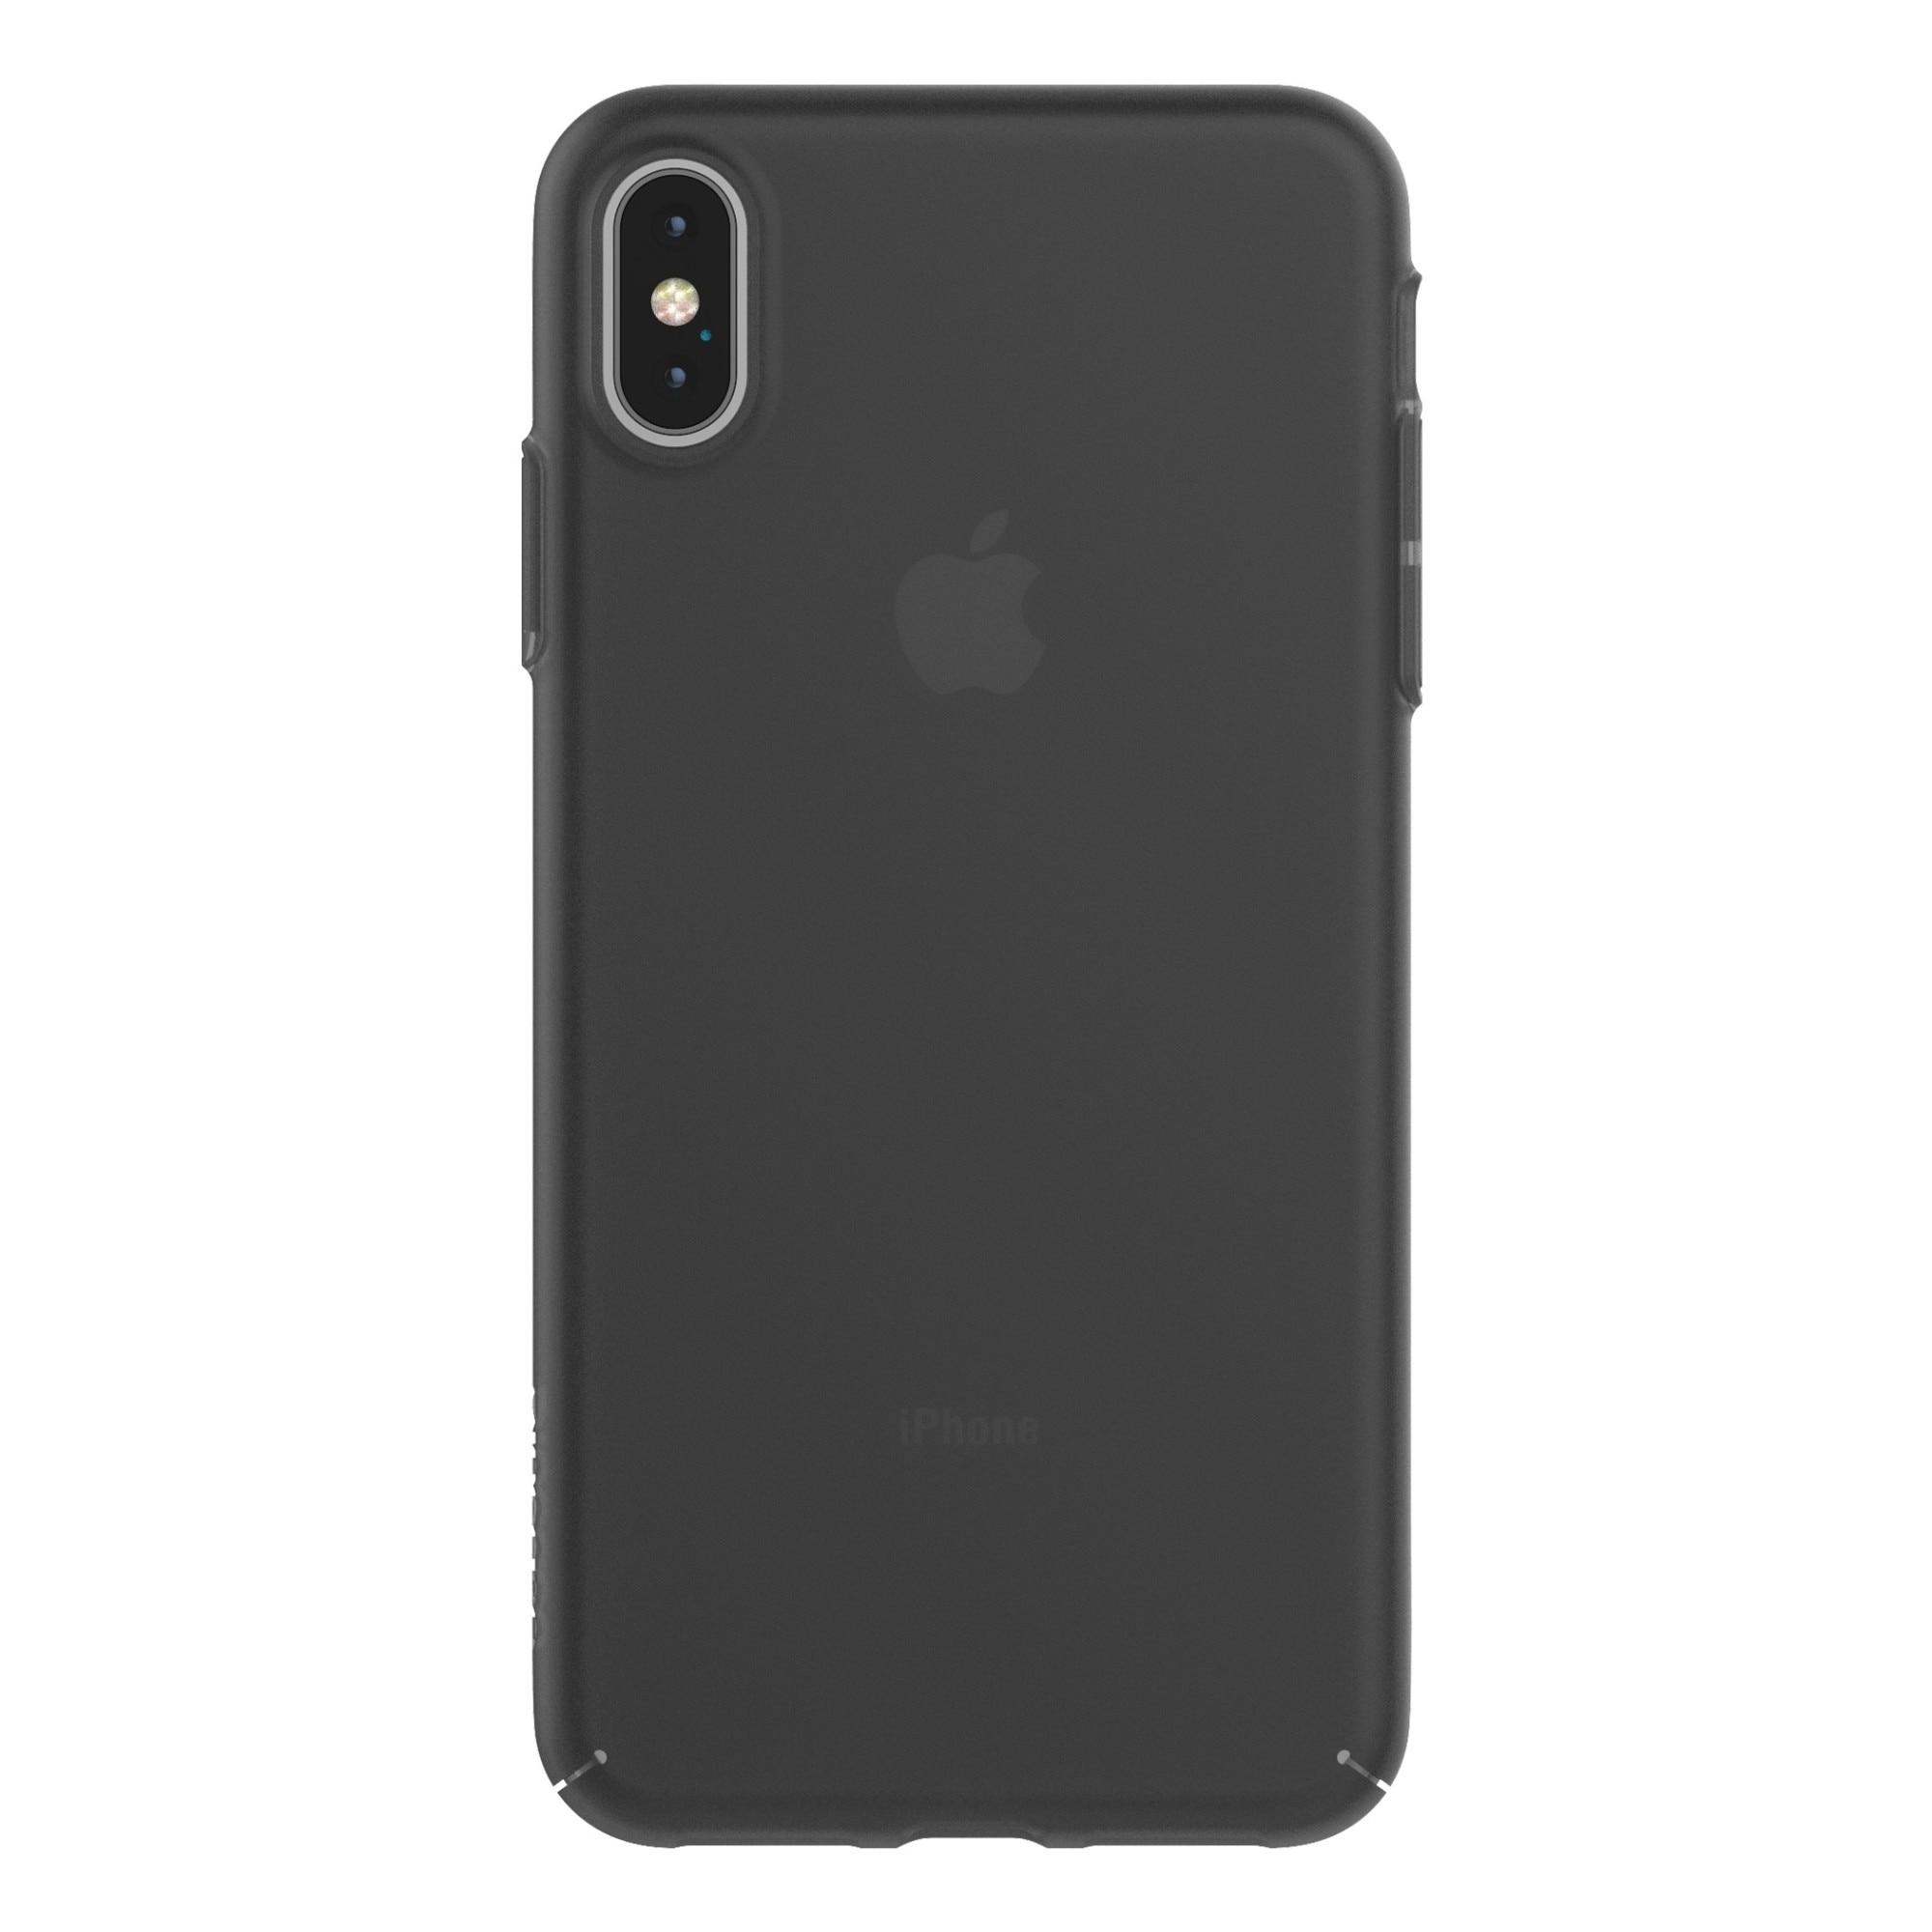 Fotografie Husa de protectie Incase Lift Case pentru Apple iPhone XS Max, Graphite